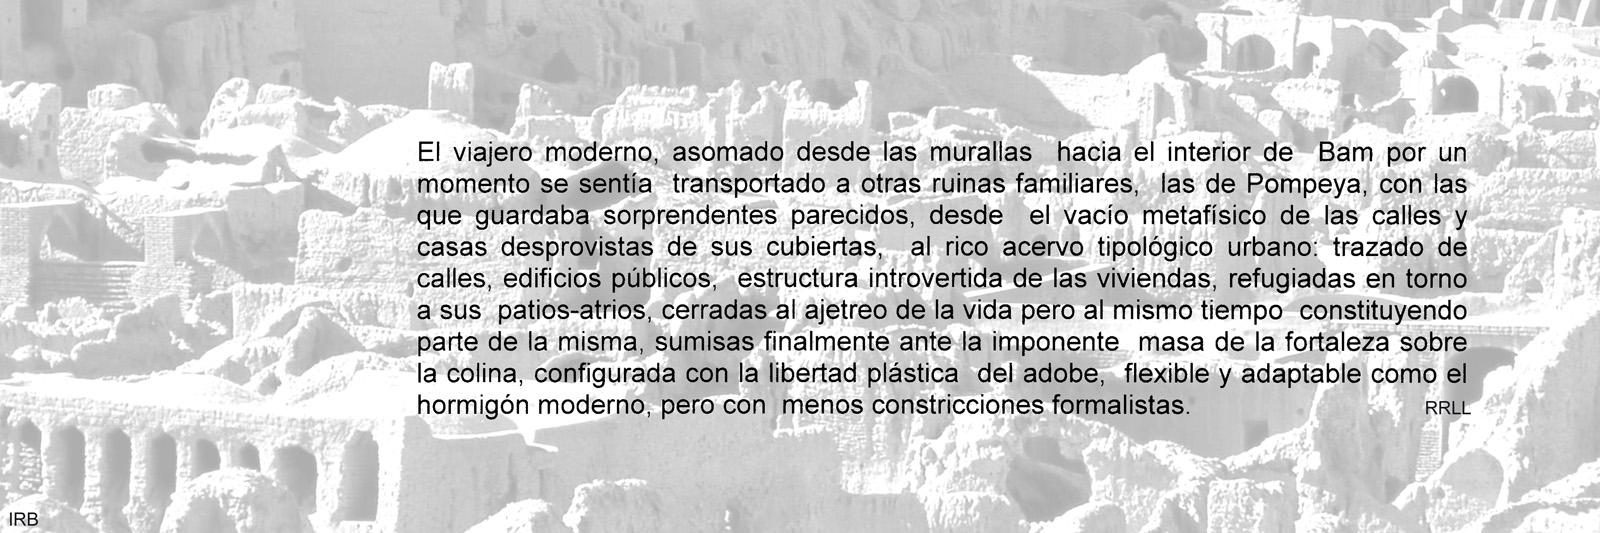 danielvillalobos-architecturalexhibition-bam-architectureofmud-69